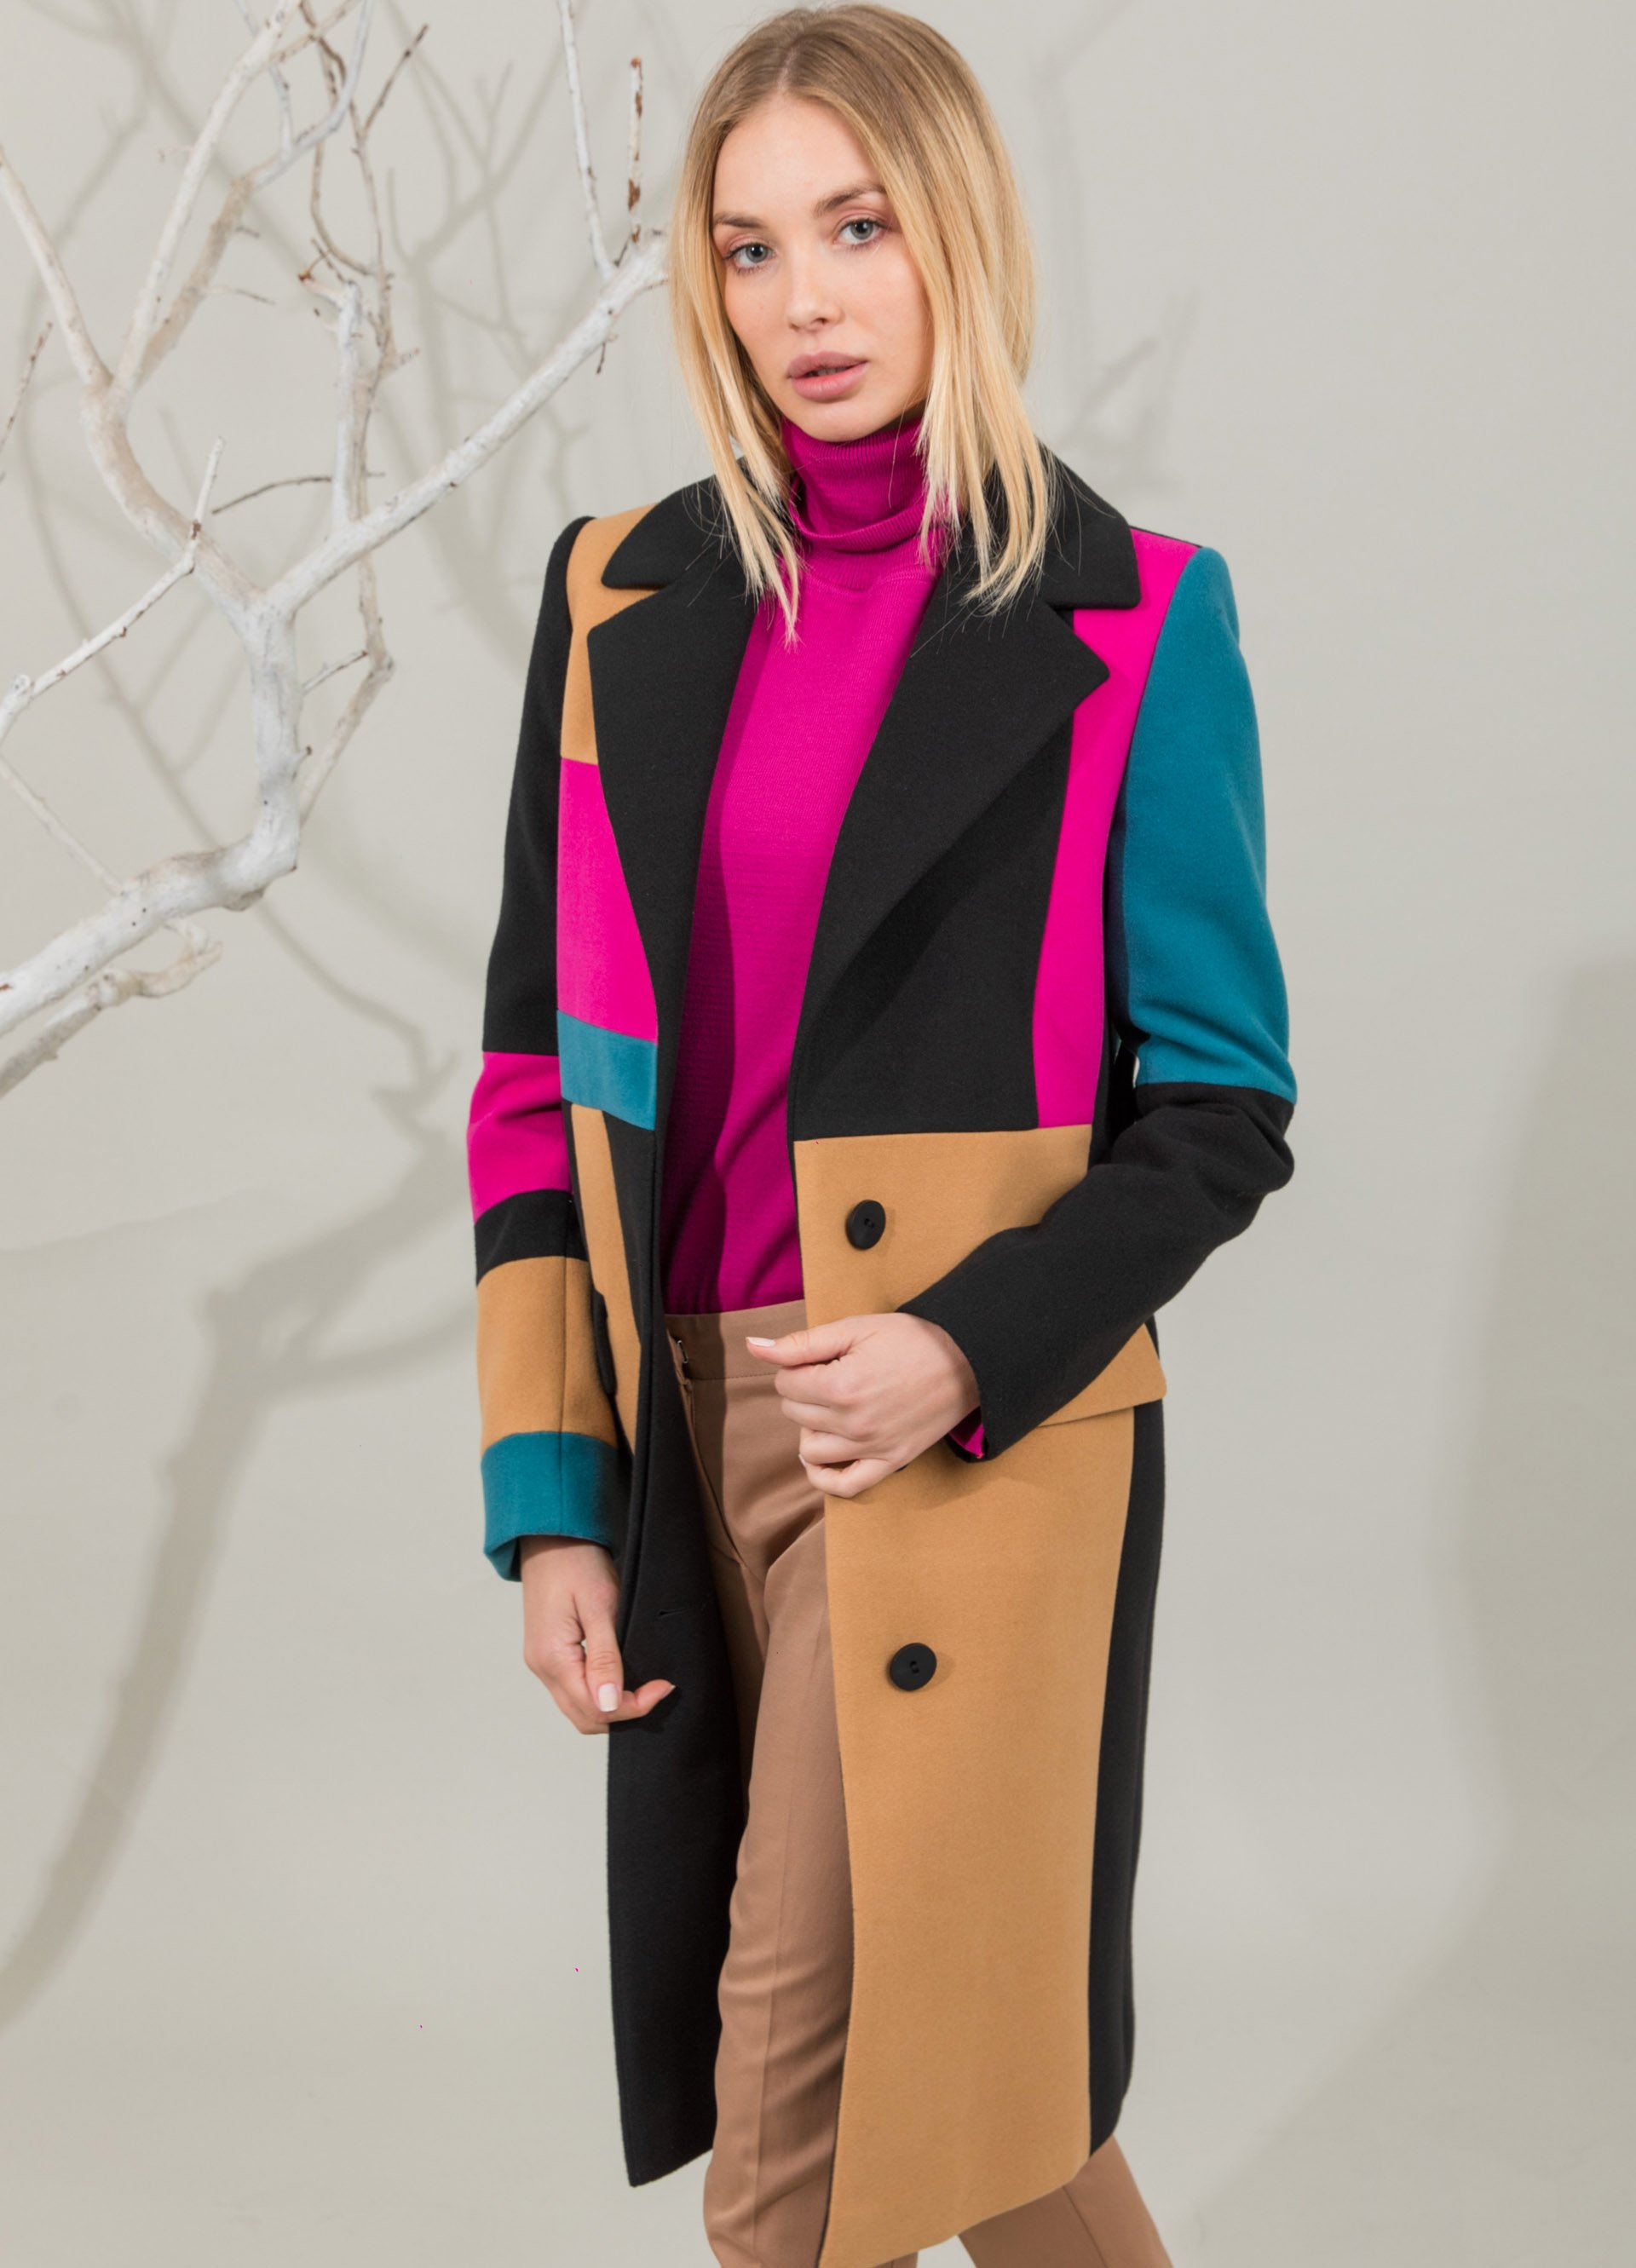 KAPUT – PS Fashion, KAPUT